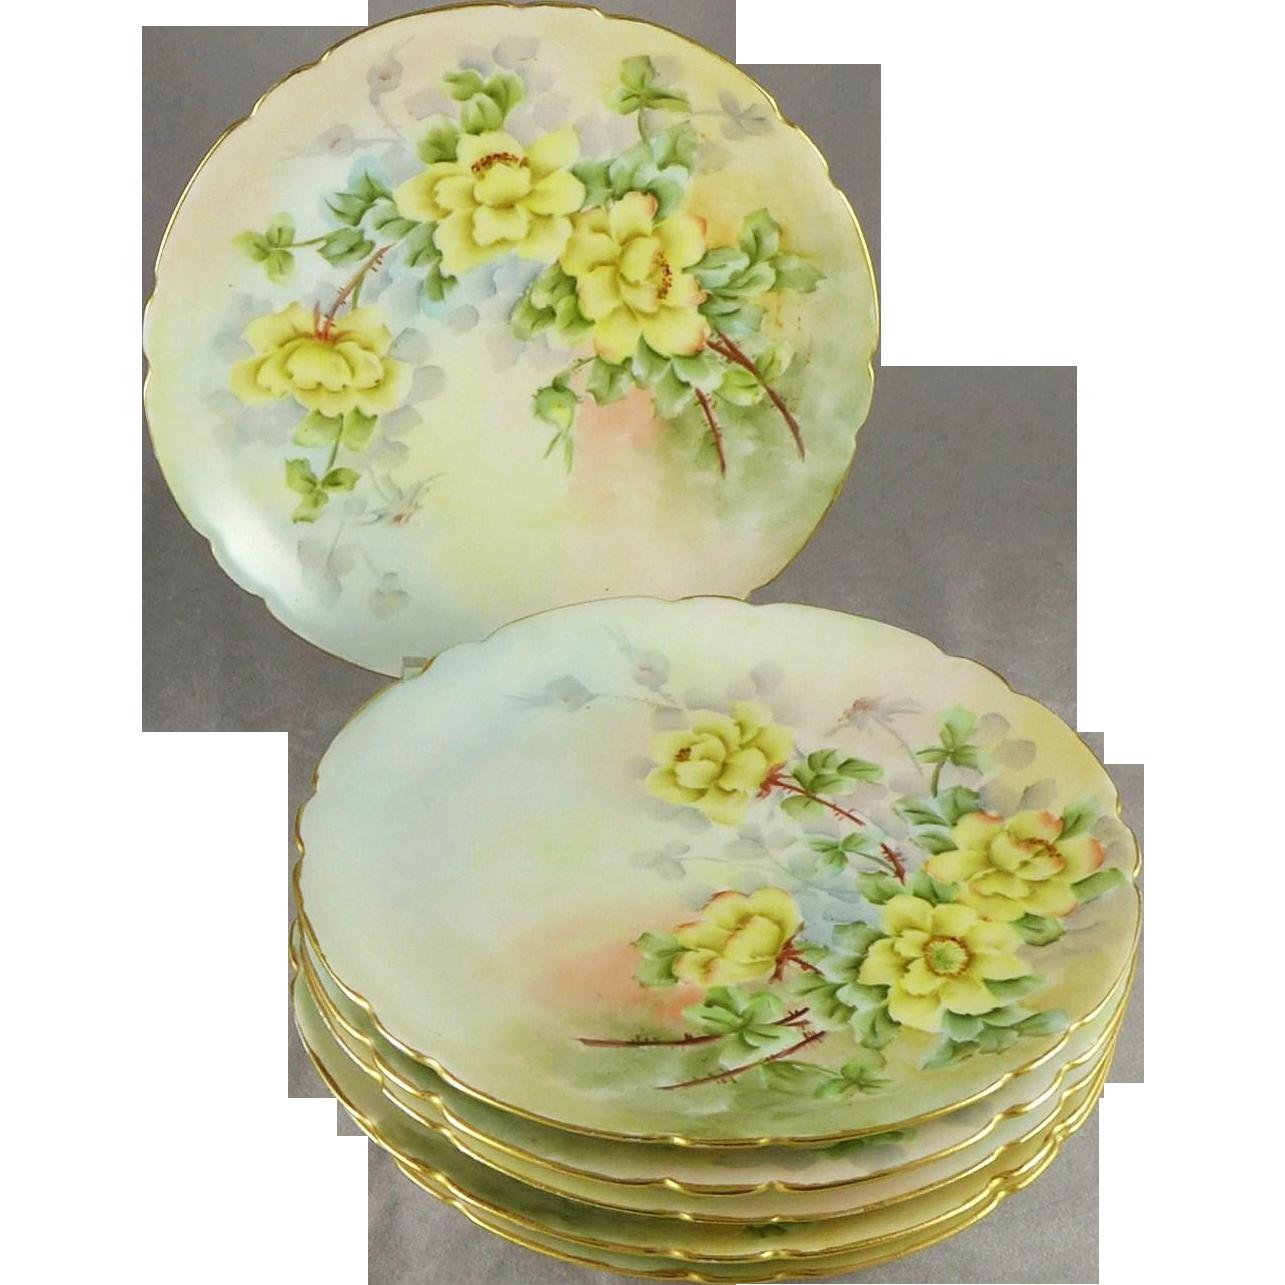 Antique Jean Pouyat Limoges Dessert Plates, Set of Six, Artist Signed